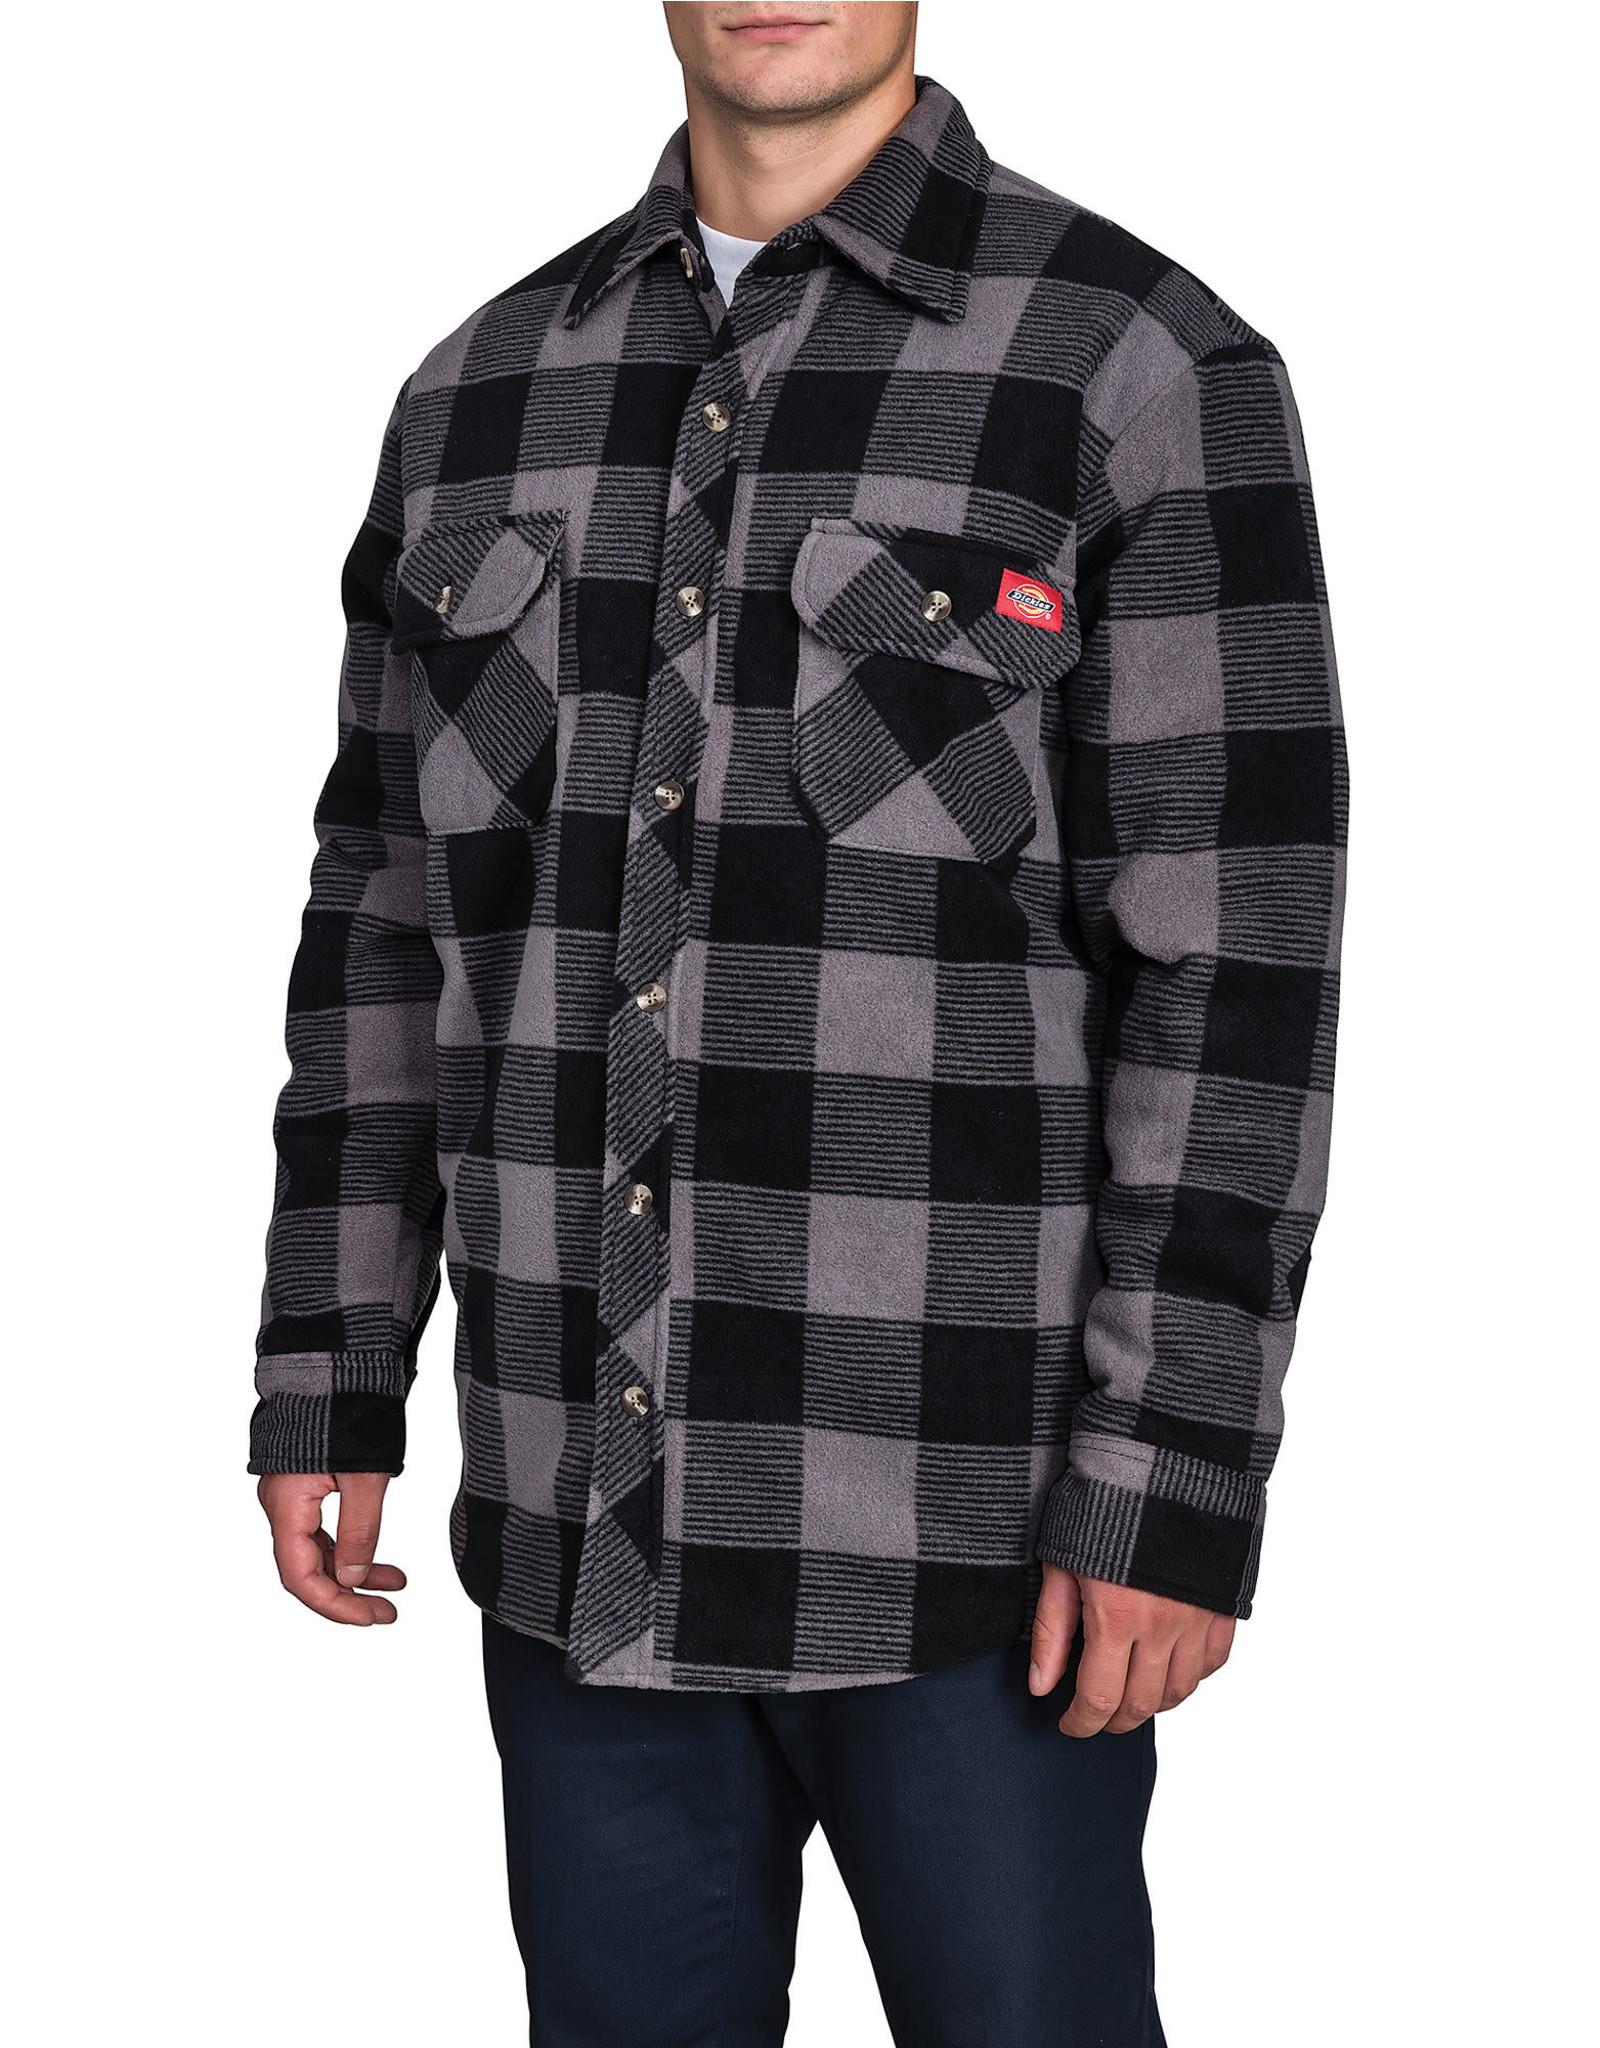 DICKIES Printed Polar Fleece Jacket